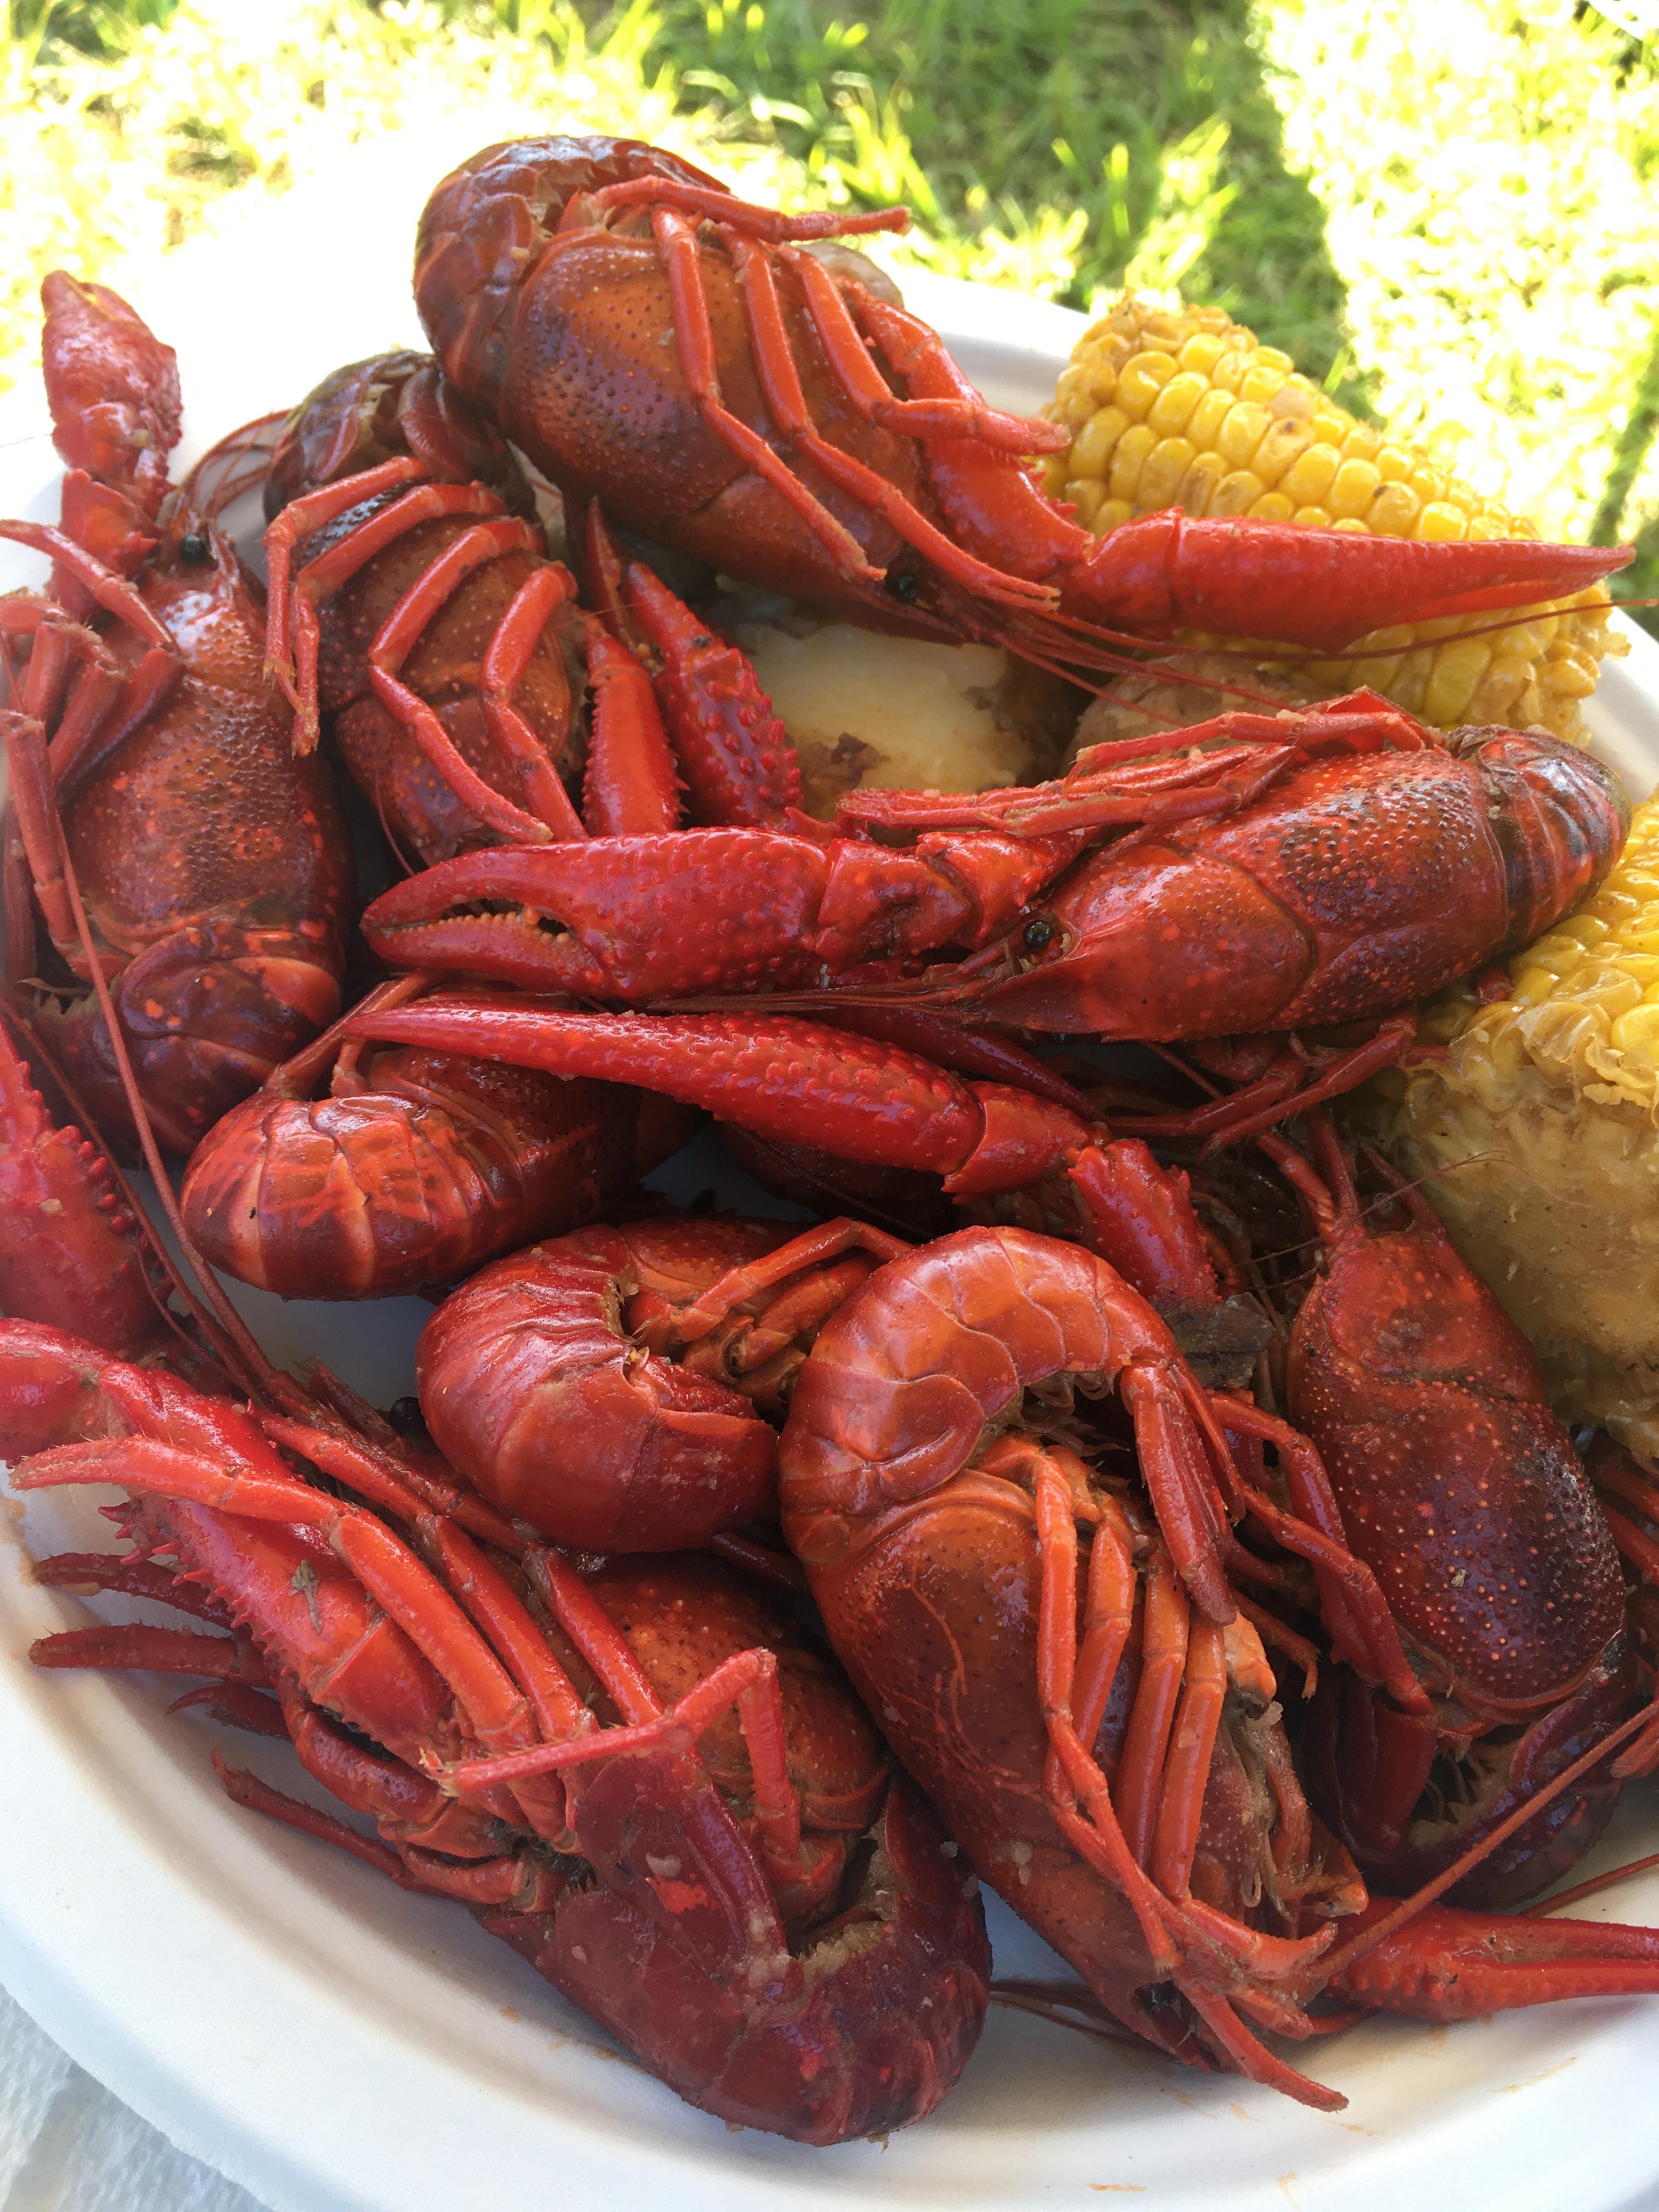 Stephanie Reybitz, ATC, and Lauren Luke, PT enjoyed the 2019 Crawfish Boil Saturday! We love calling Pike Road our home! #EncoreRehab #mypikeroad